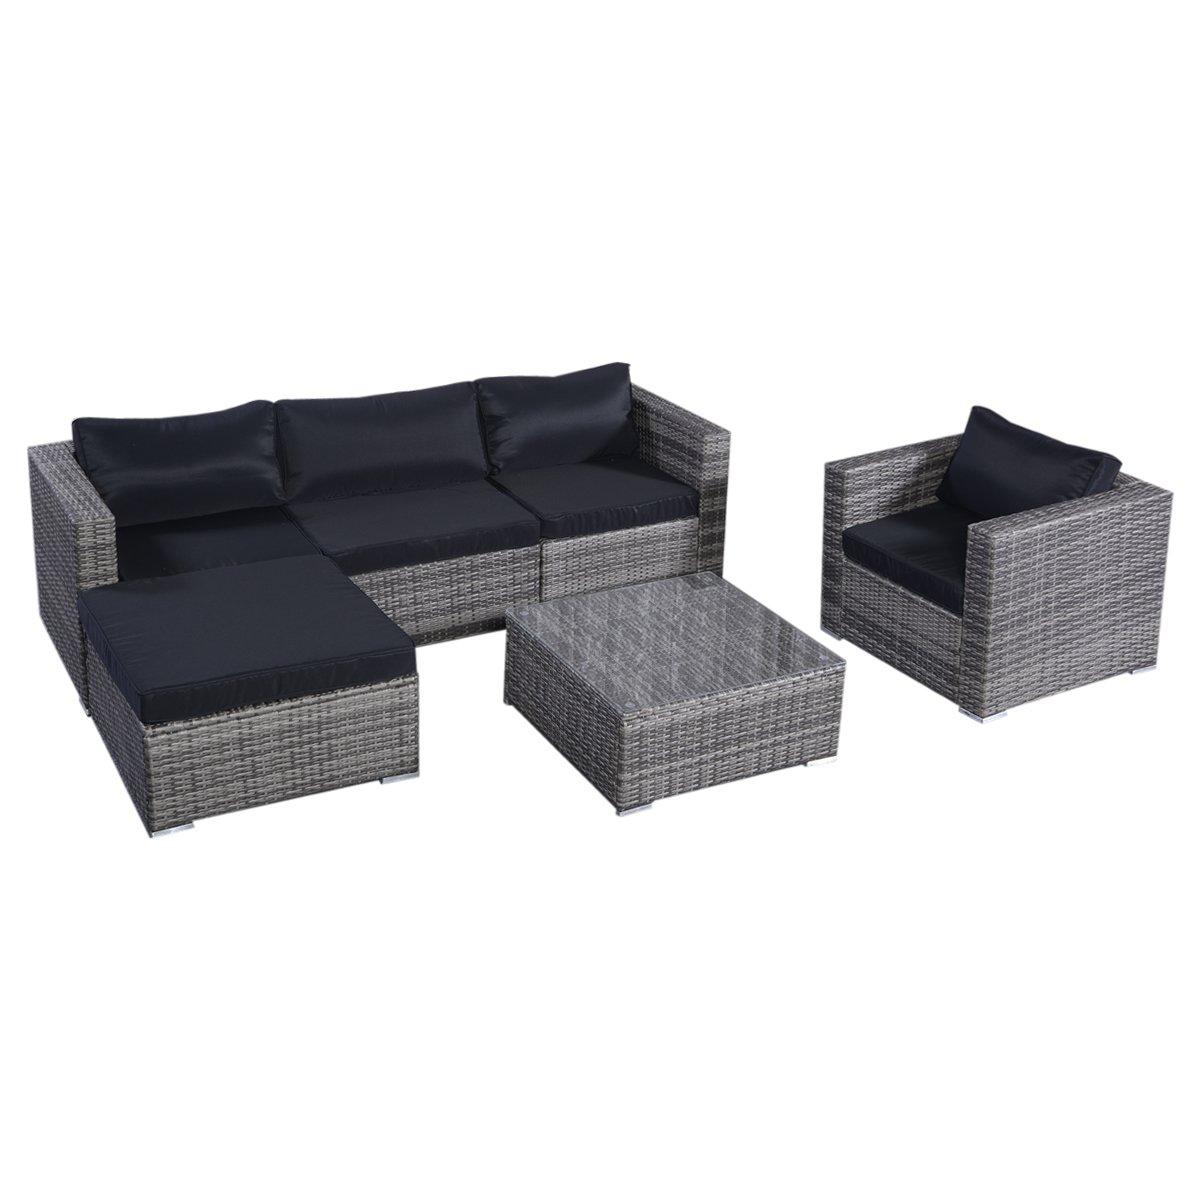 Amazon.de: 13tlg.lounge Set Gartenmöbel Rattan Set Polyrattan ... Sitzgruppe Im Garten Gartenmobel Sets